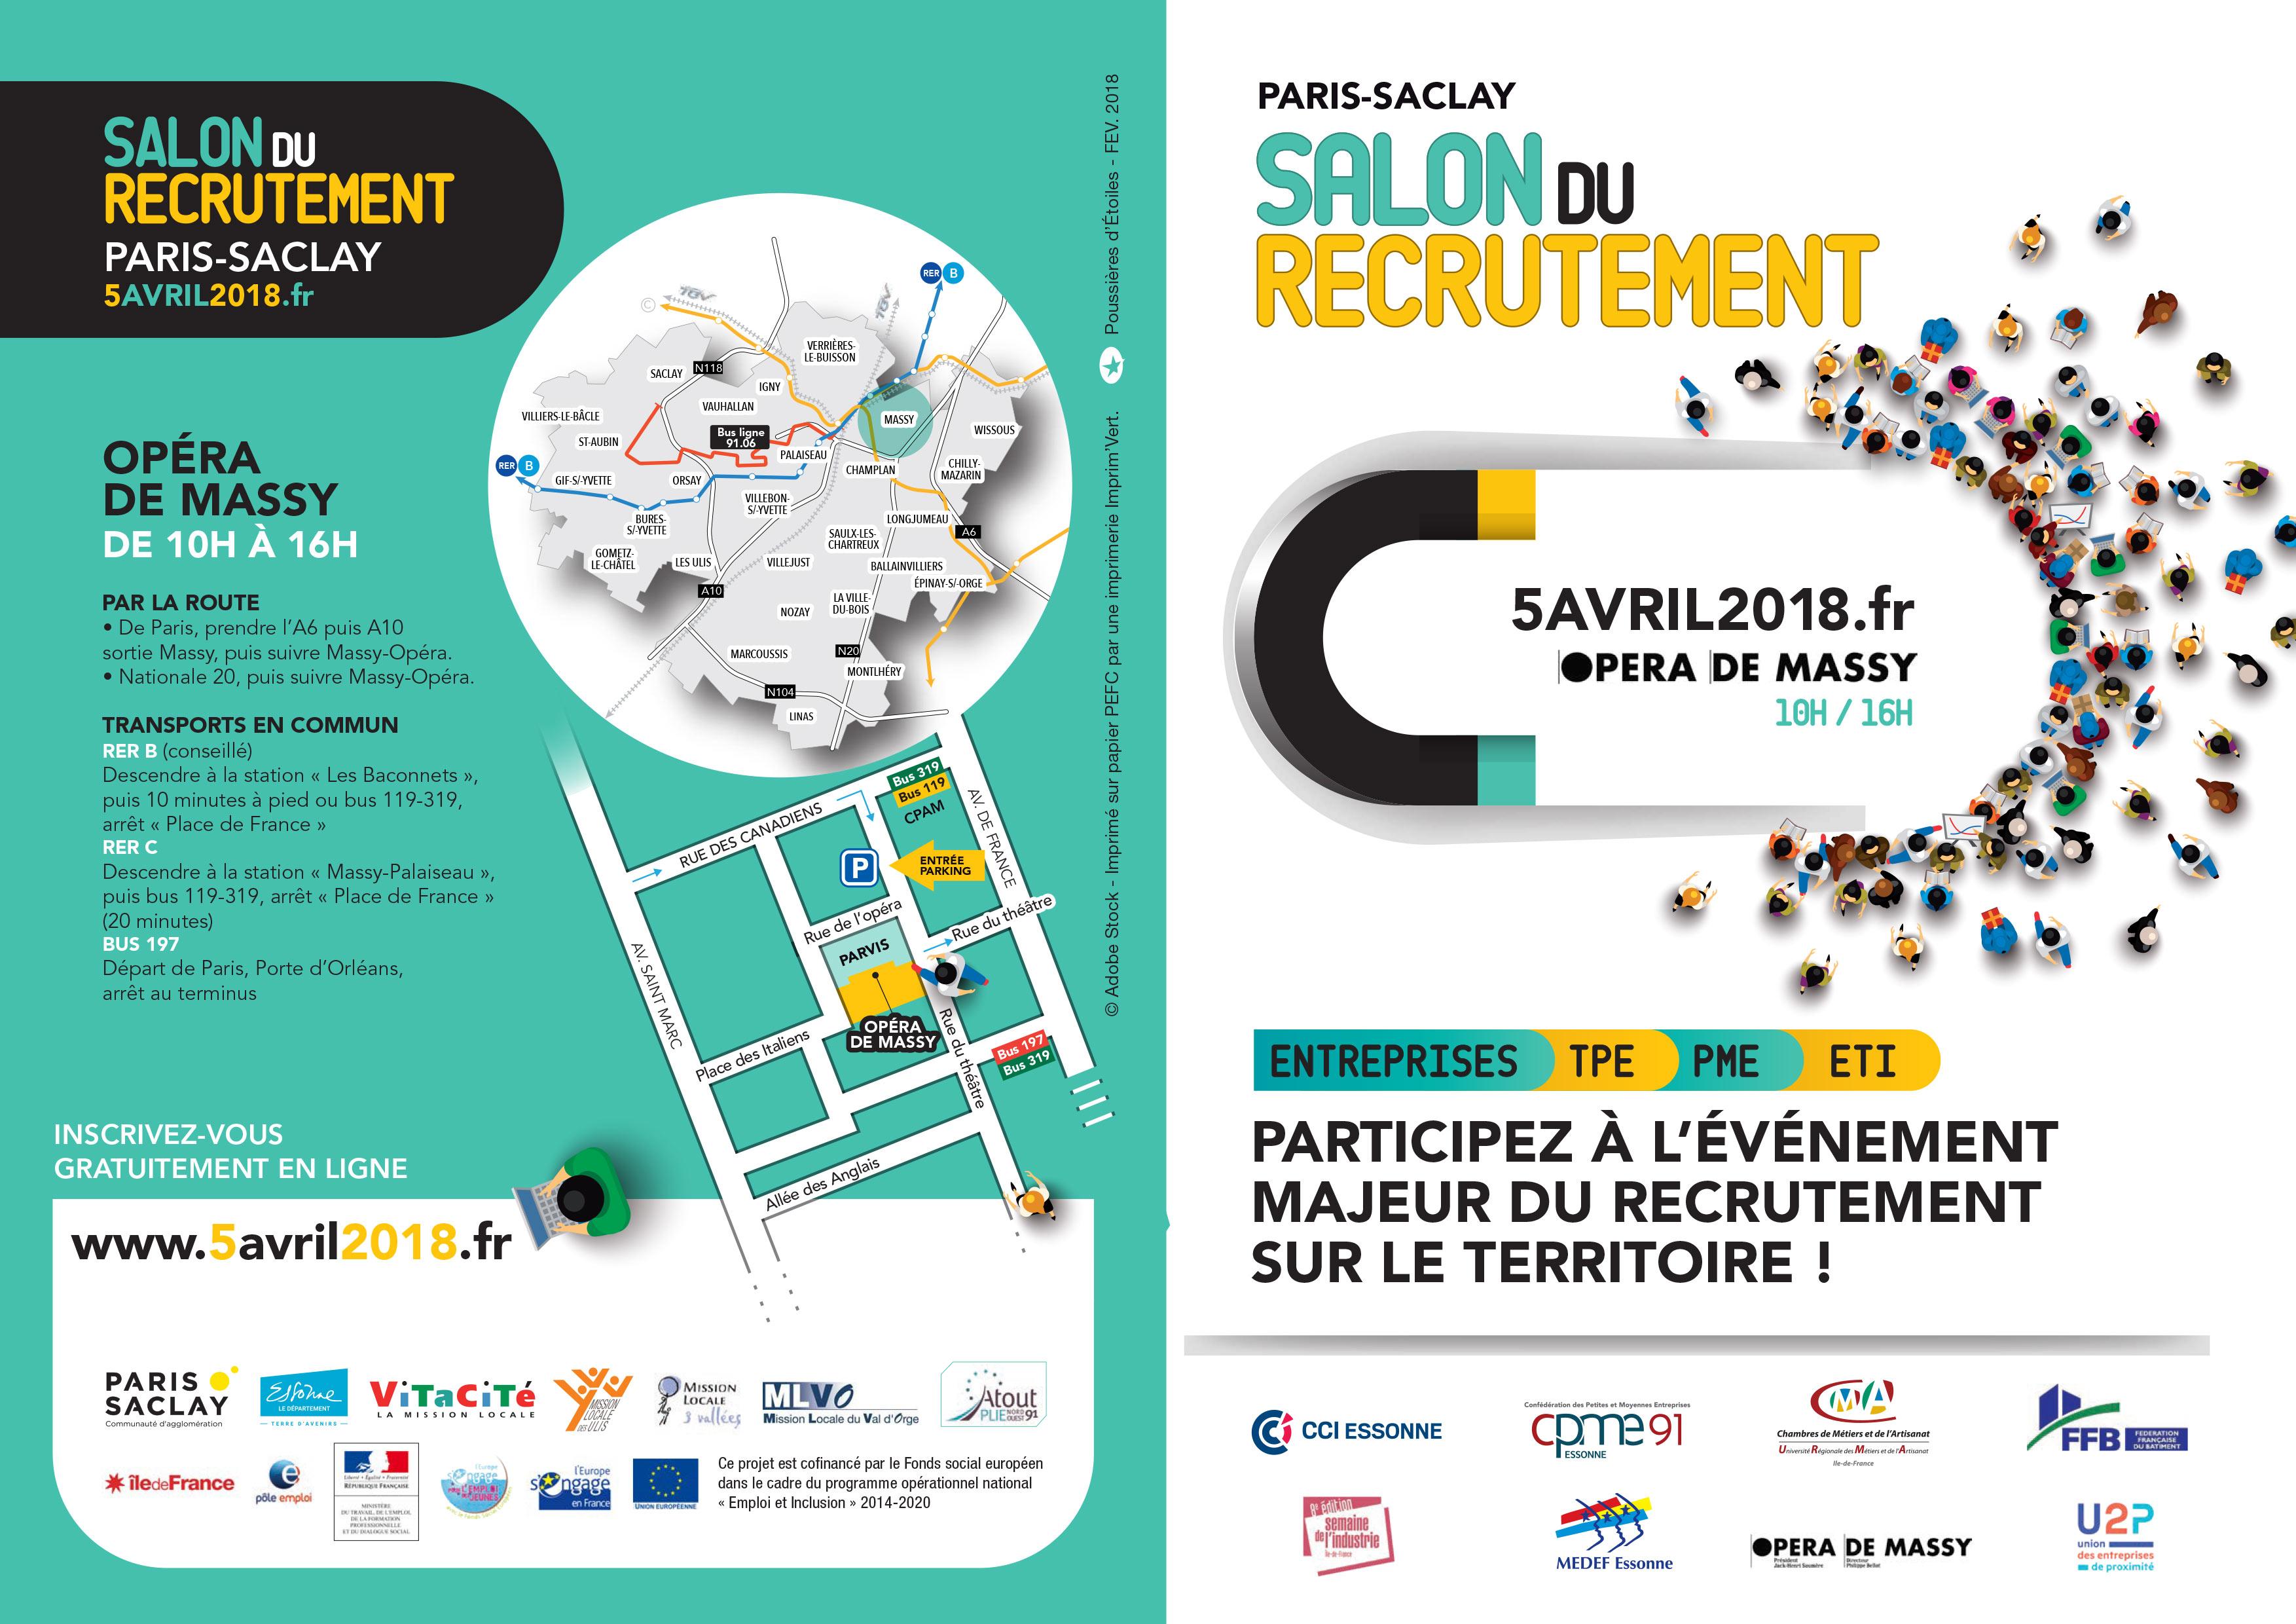 Salon du recrutement paris saclay arml idf - Salon du recrutement ...